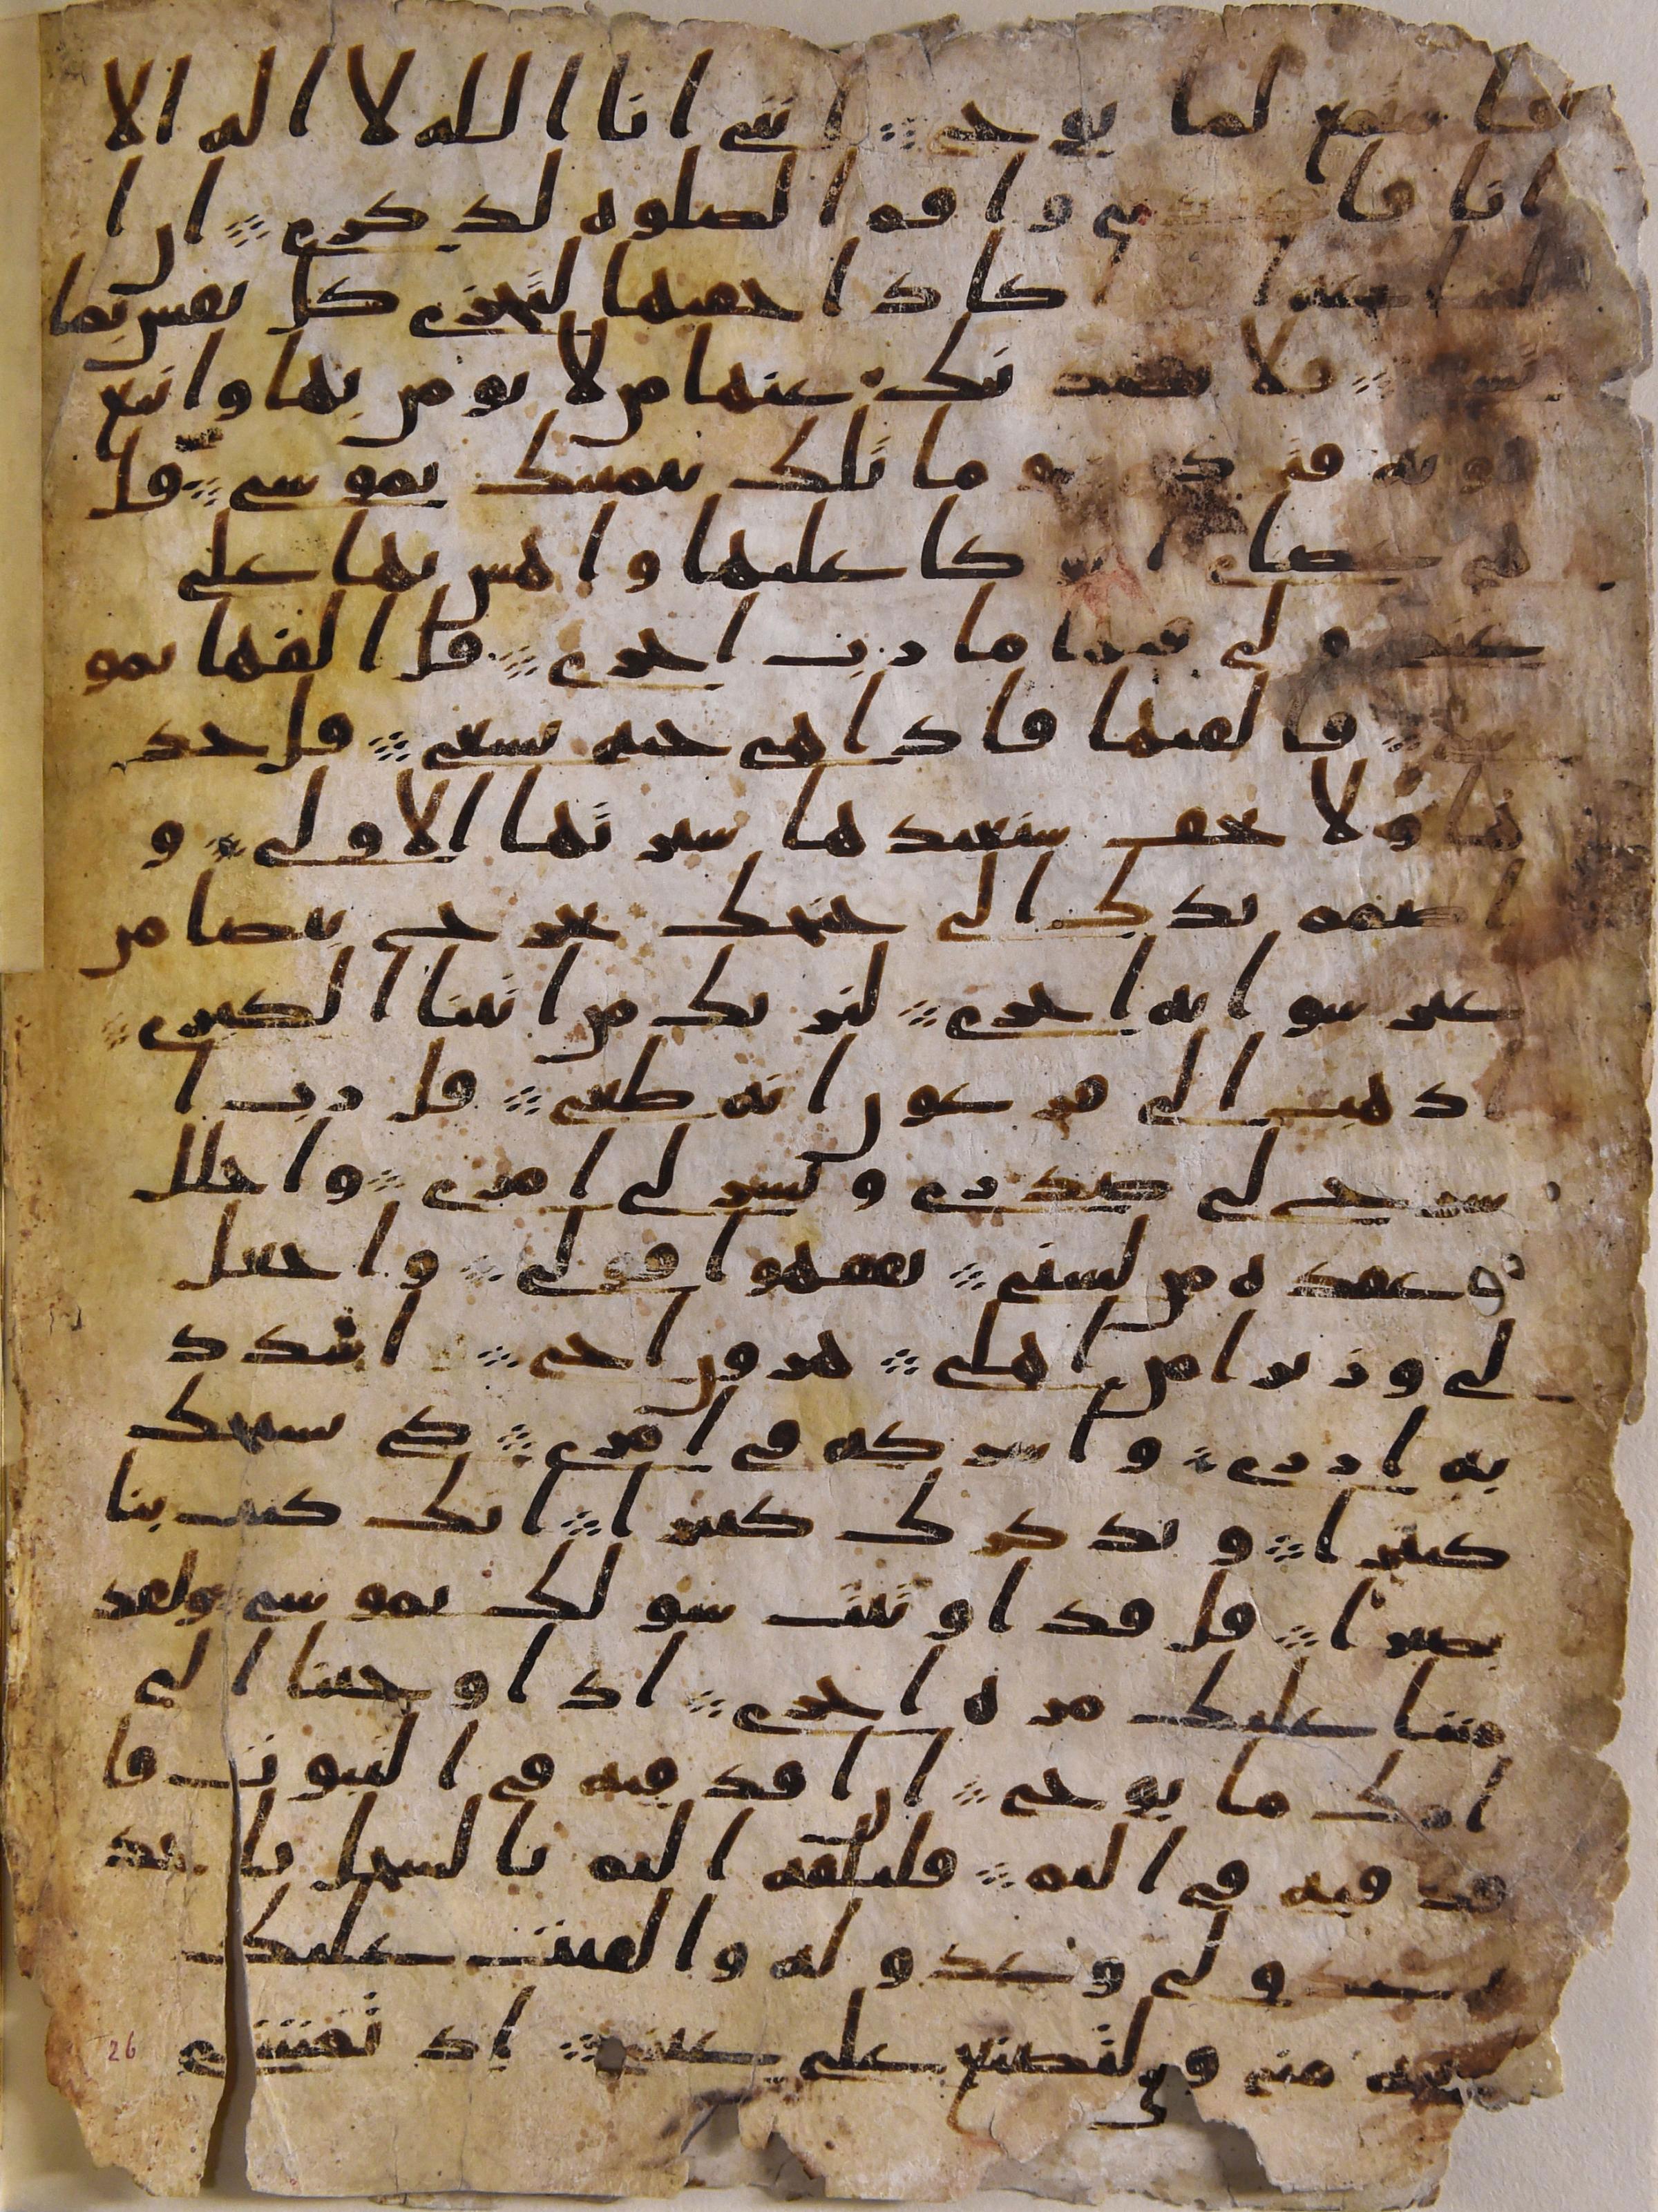 Quran found oldest Sanaa manuscript